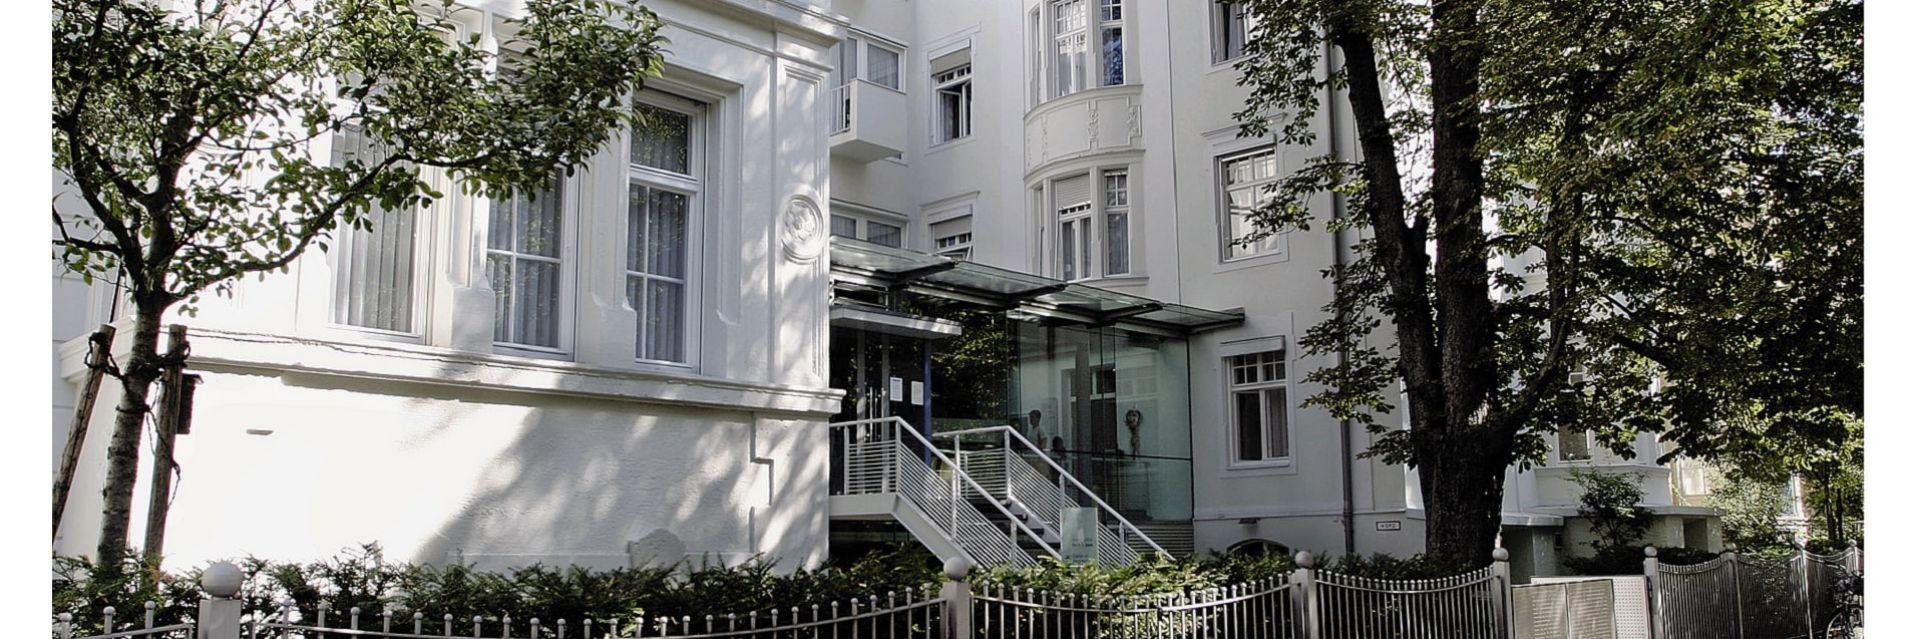 ARTEMED Specialty Hospital Munich